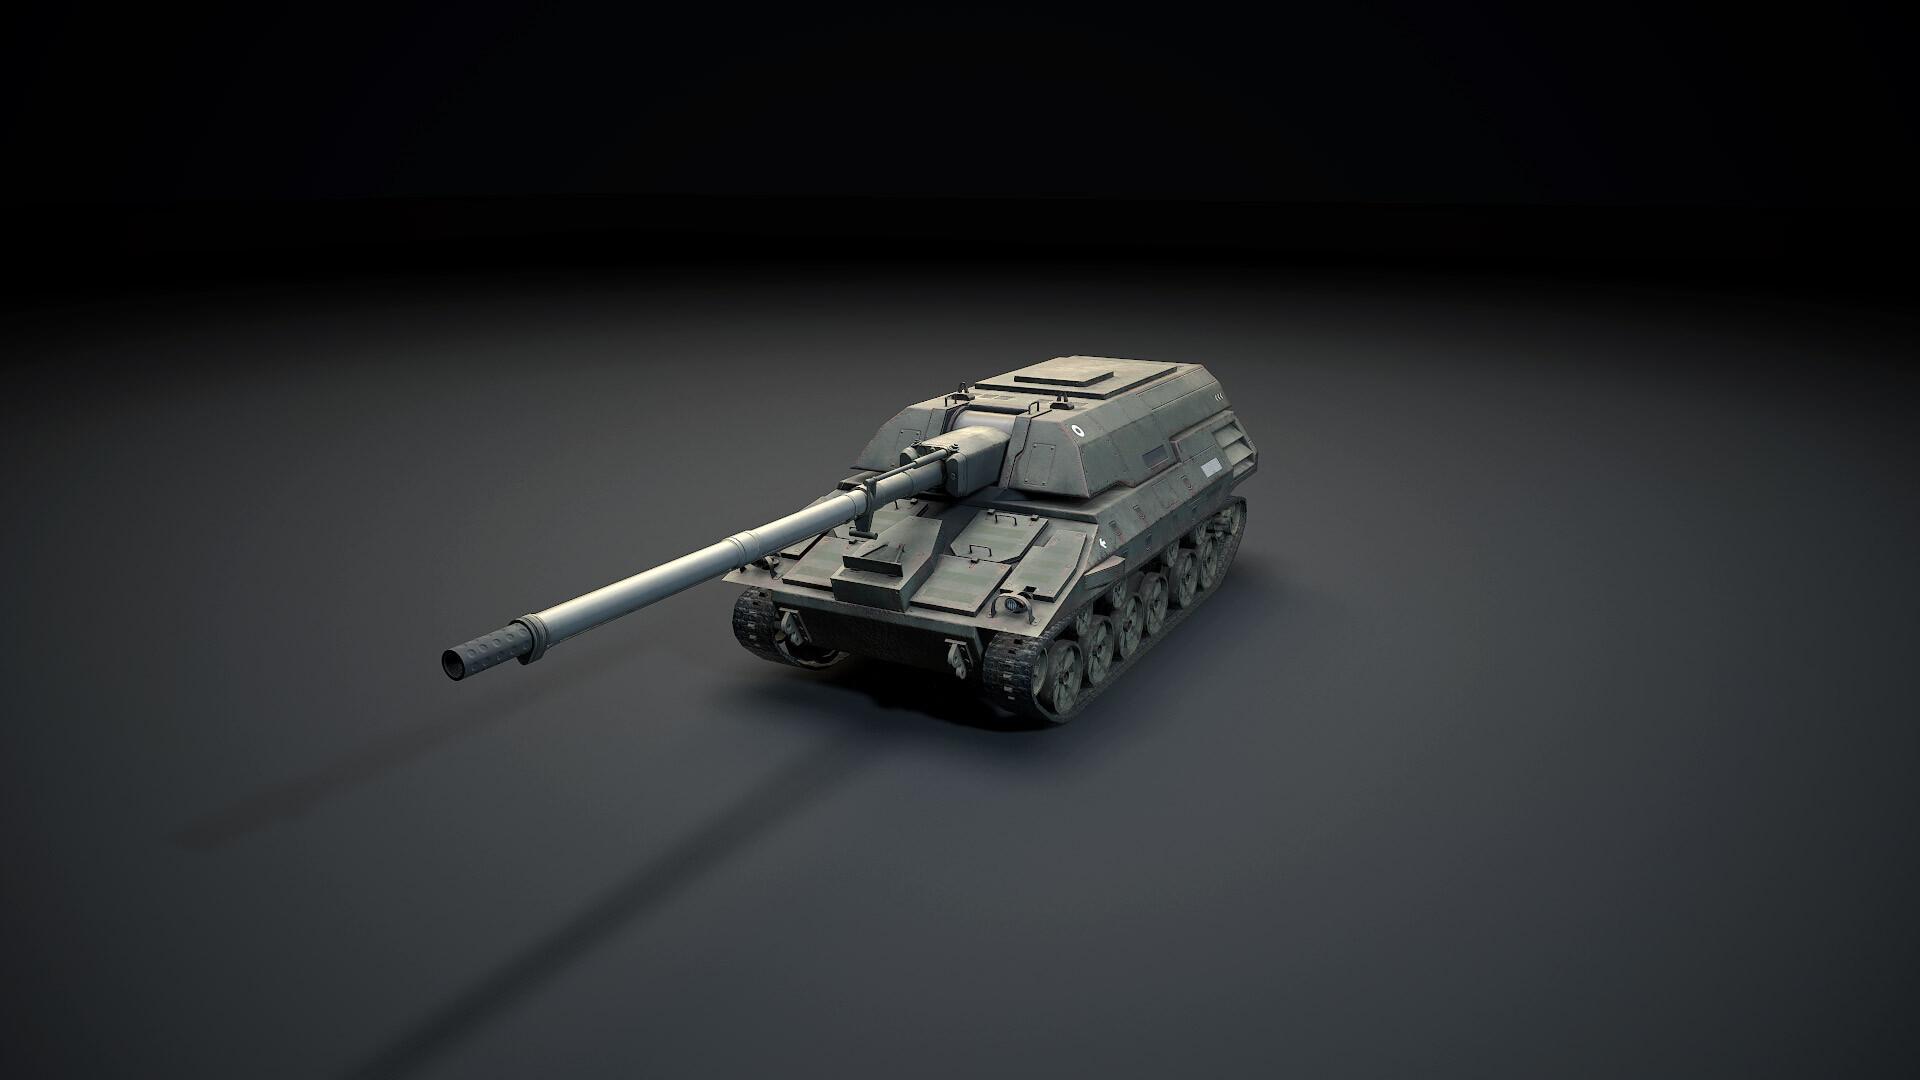 ArtStation - Tanks Pack #2, Alex Tsuba